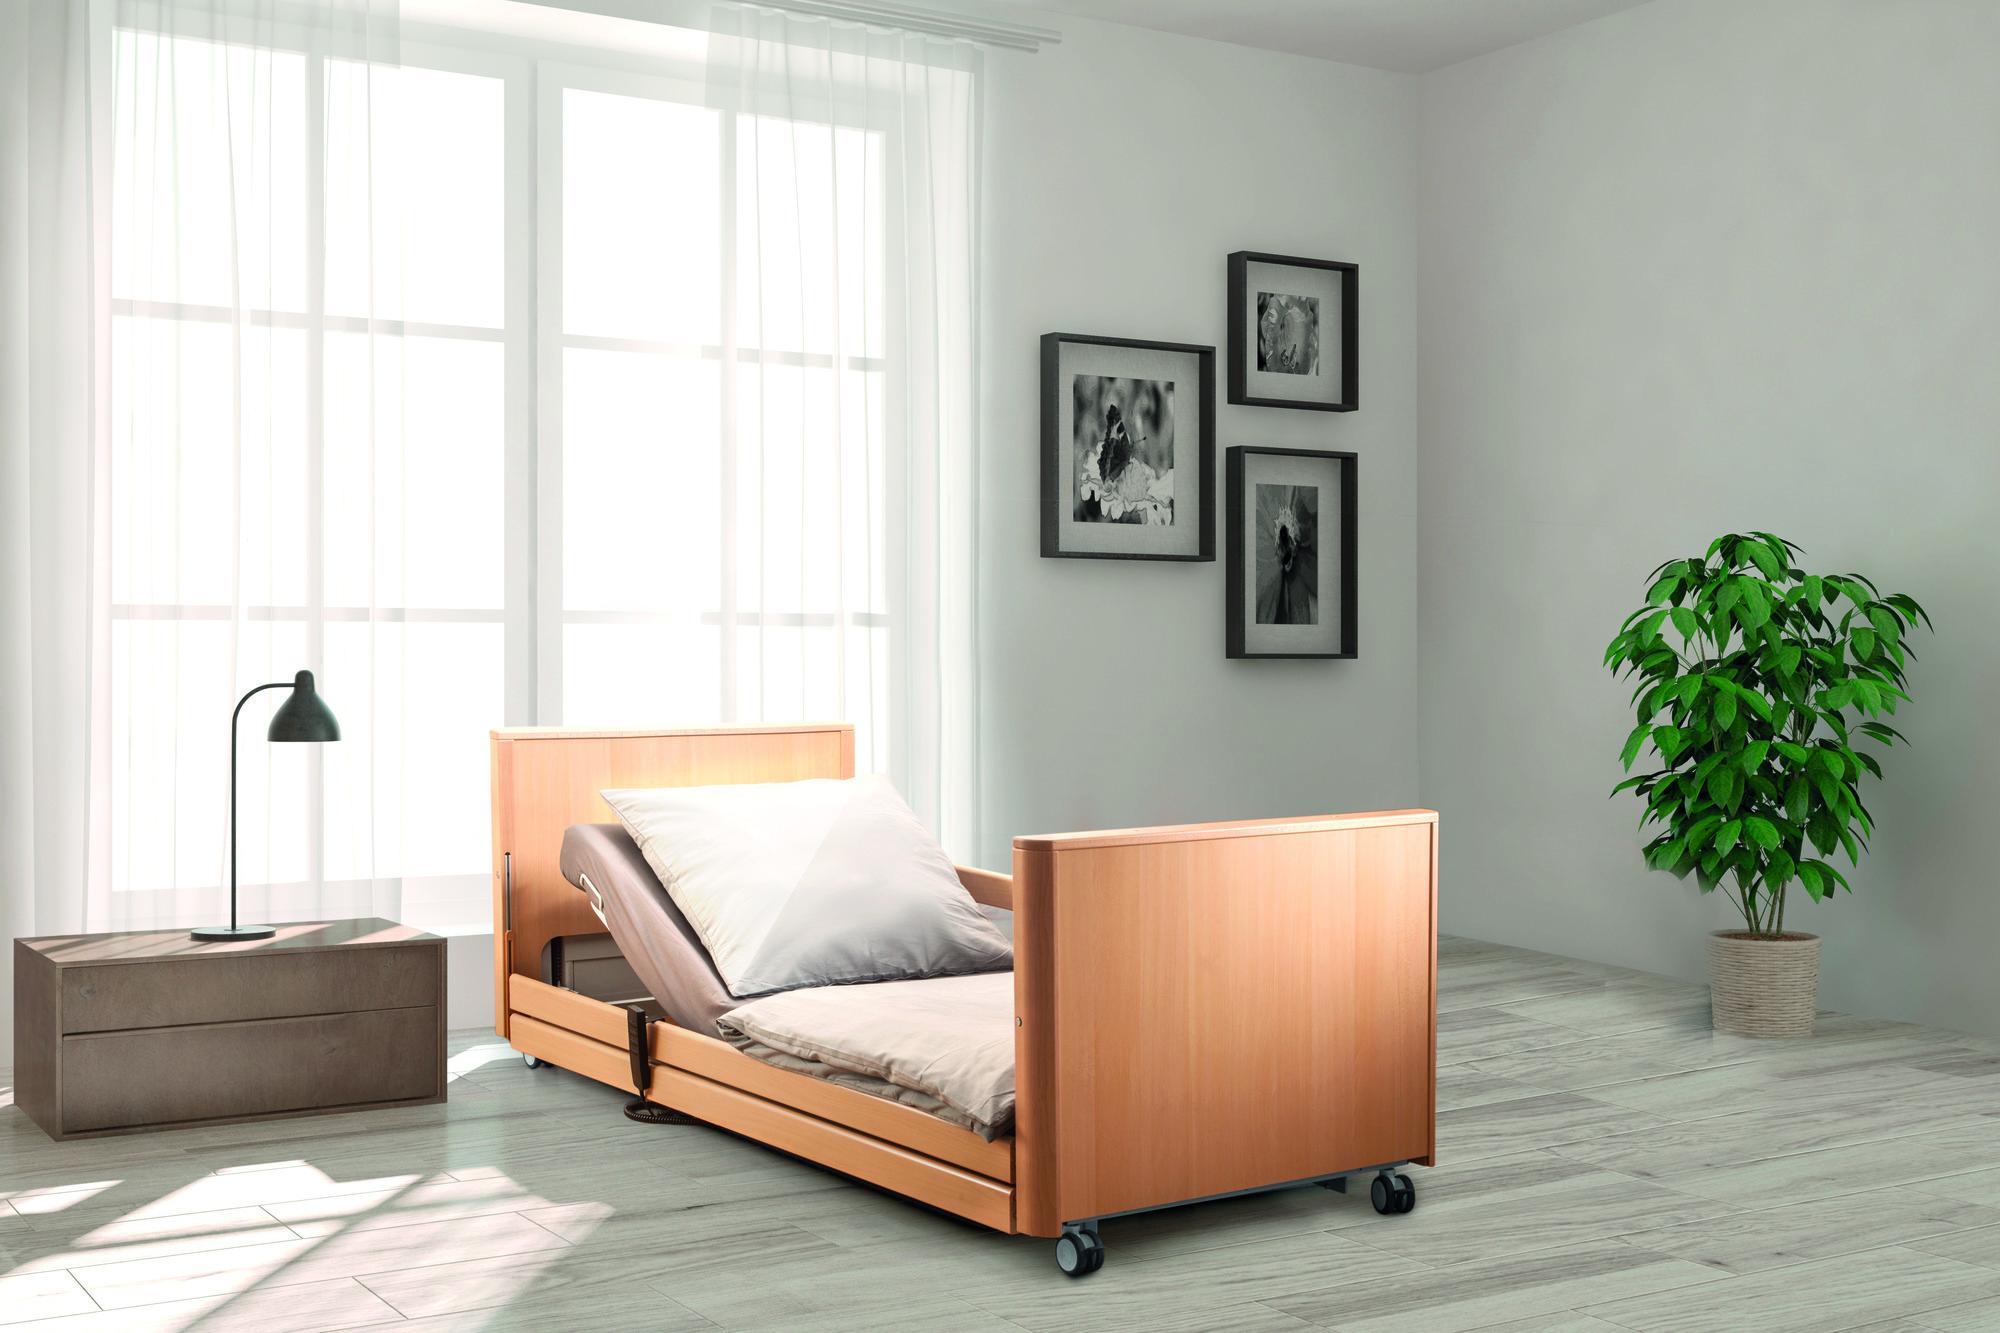 1550856720-care-produkte-pflegebett-niedrigbett-lisa.jpg